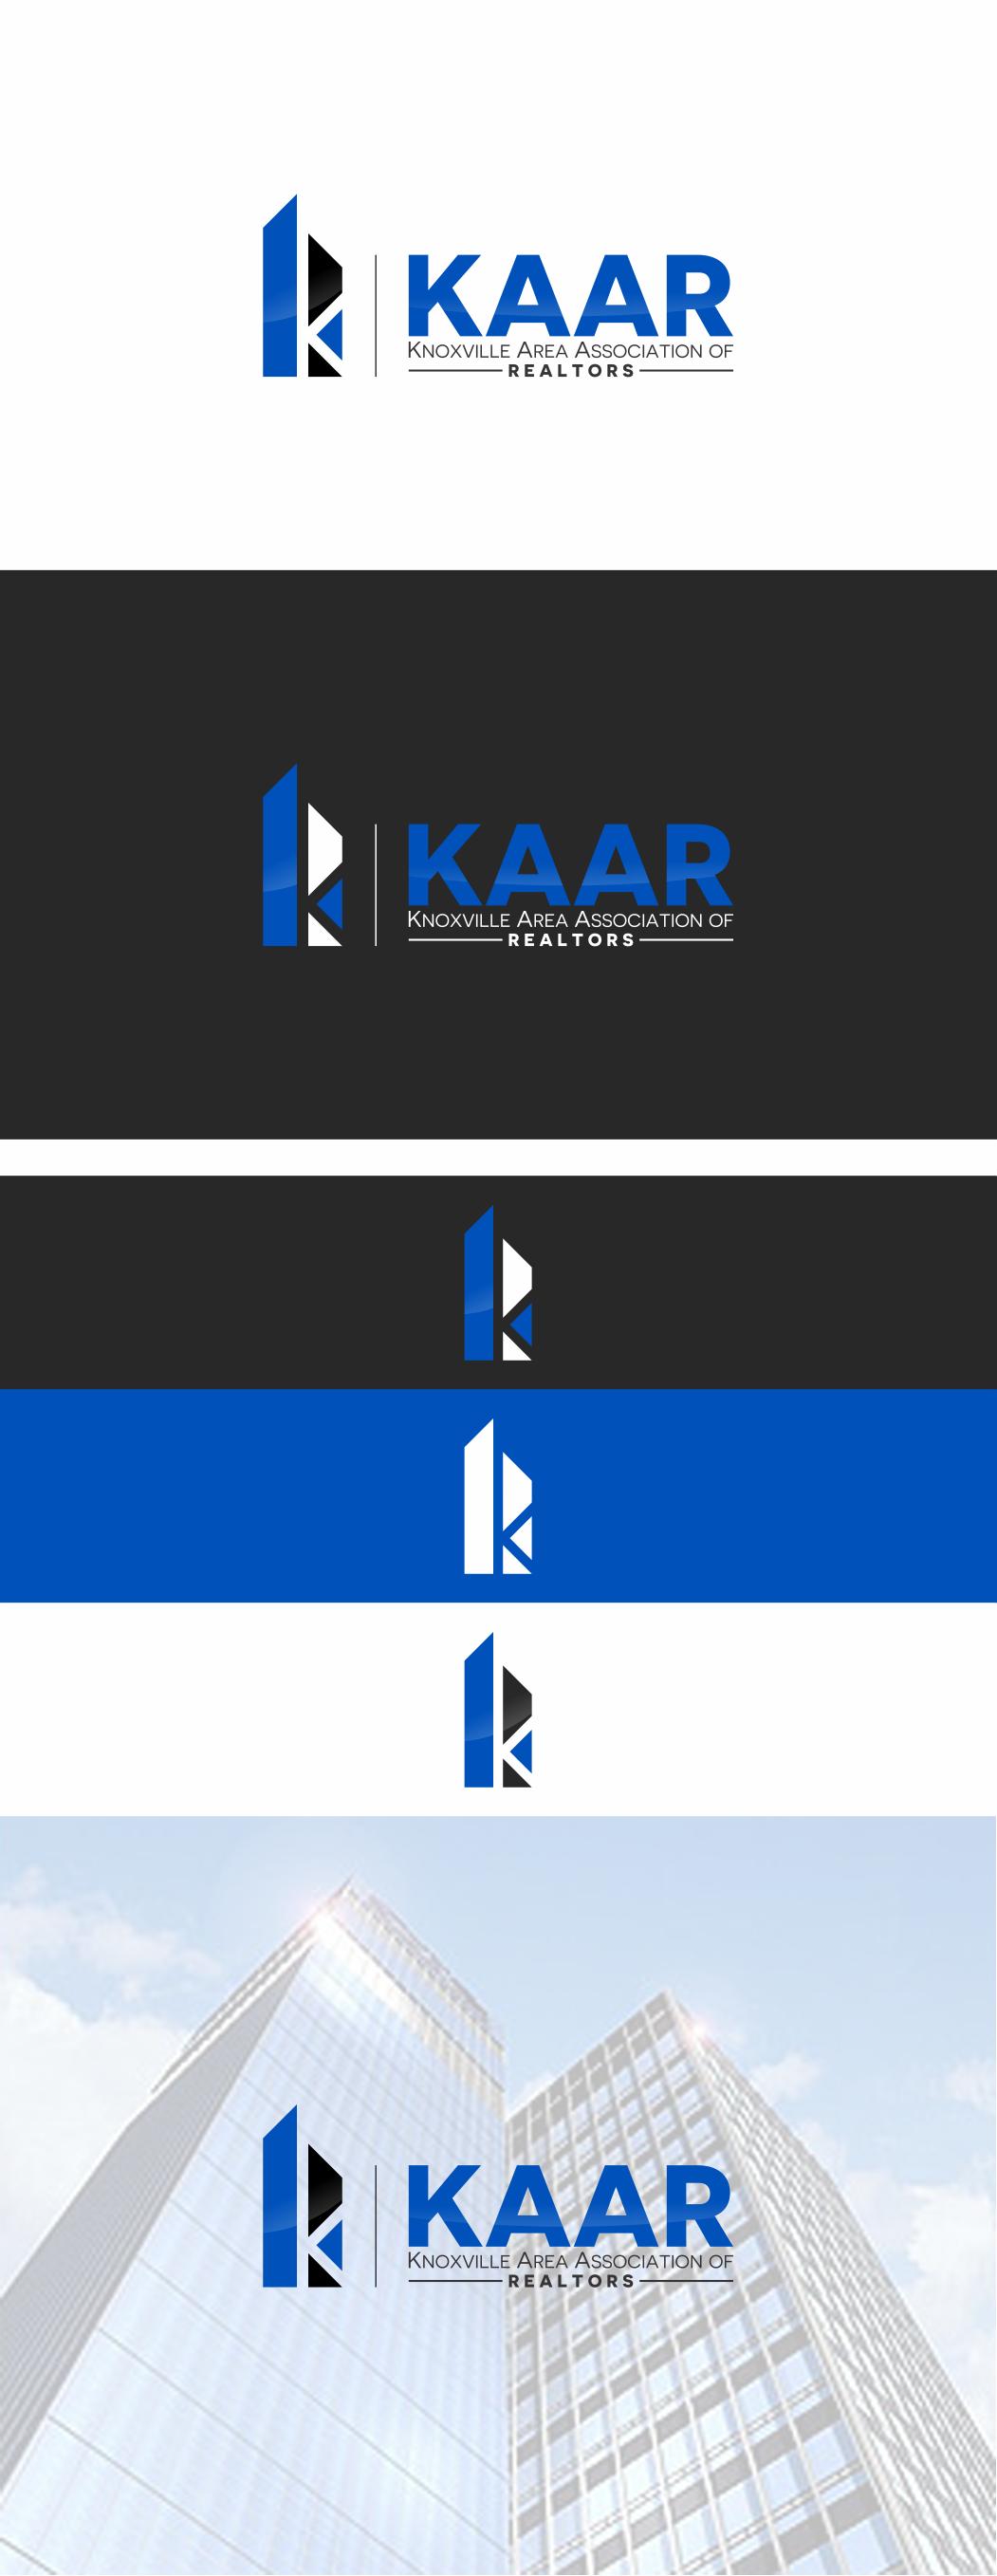 Design a prominent logo for KAAR (Knoxville Area Association of Realtors)